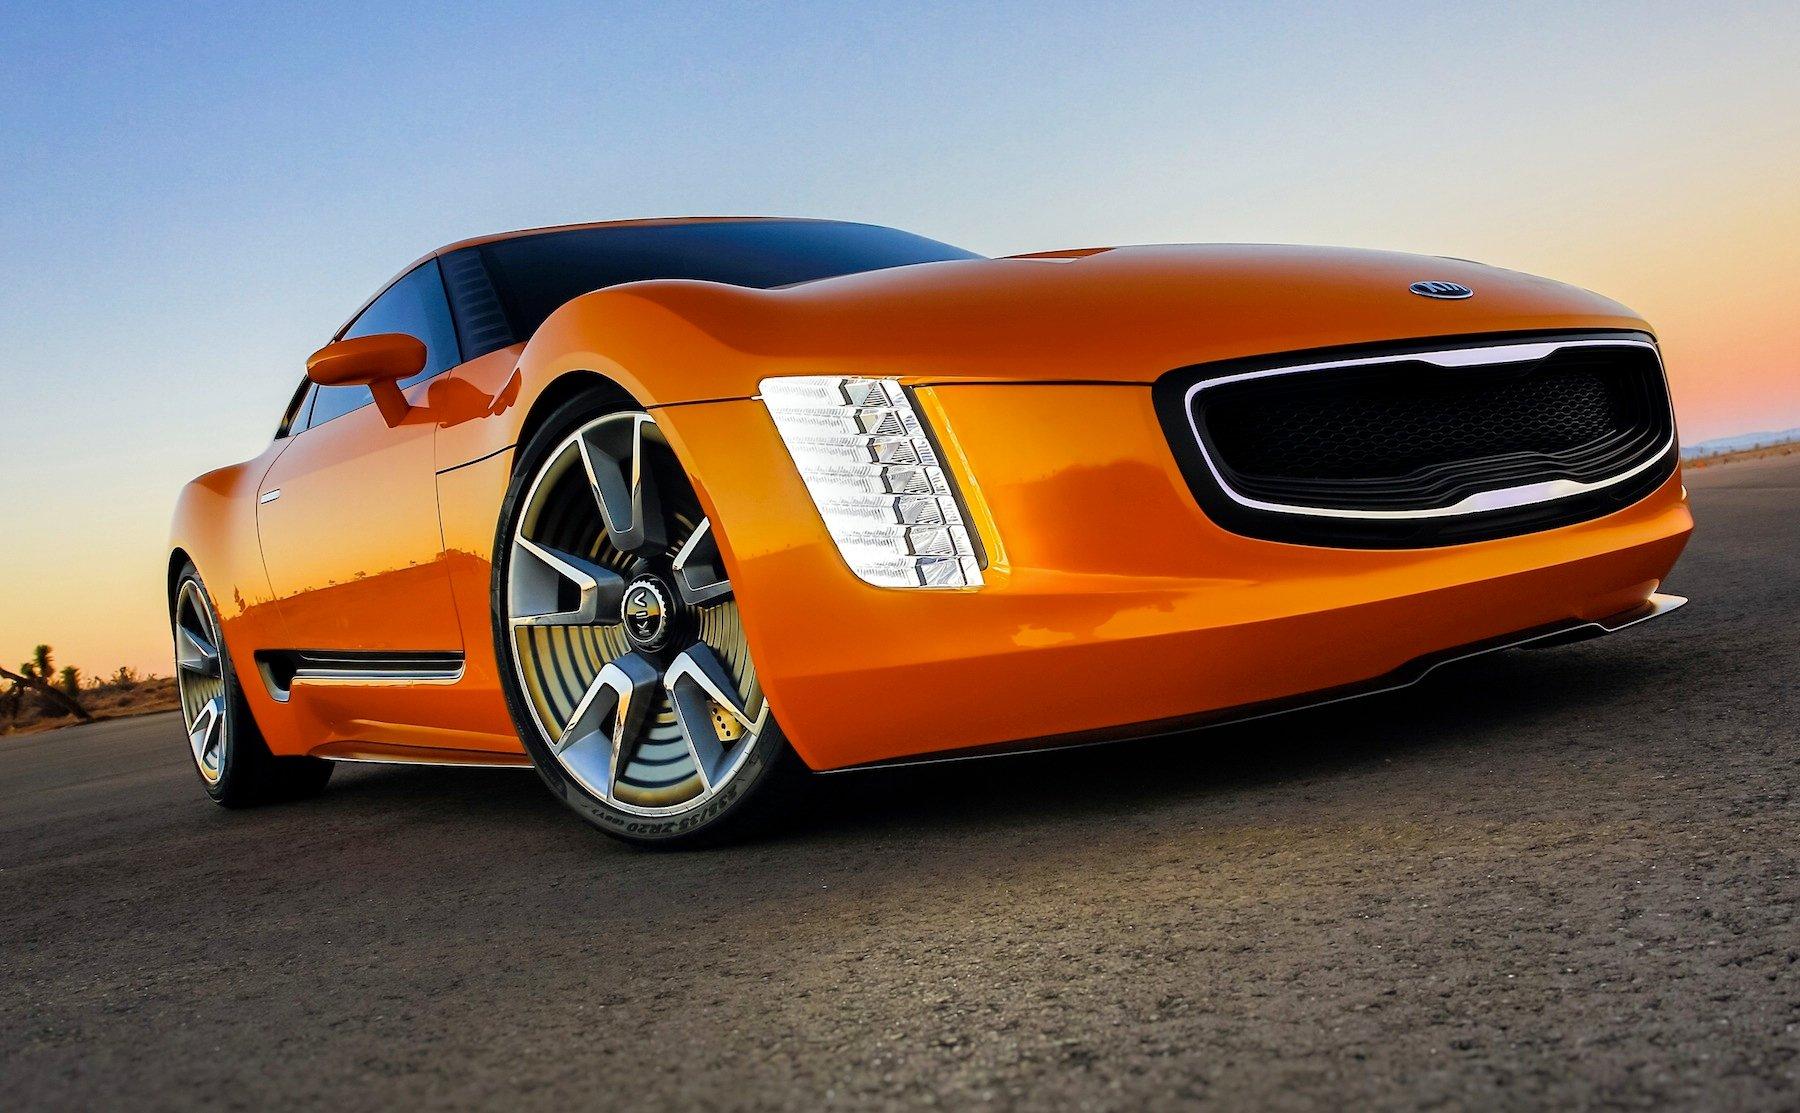 kia gt4 stinger aggressive sports car concept unveiled photos 1 of 9. Black Bedroom Furniture Sets. Home Design Ideas